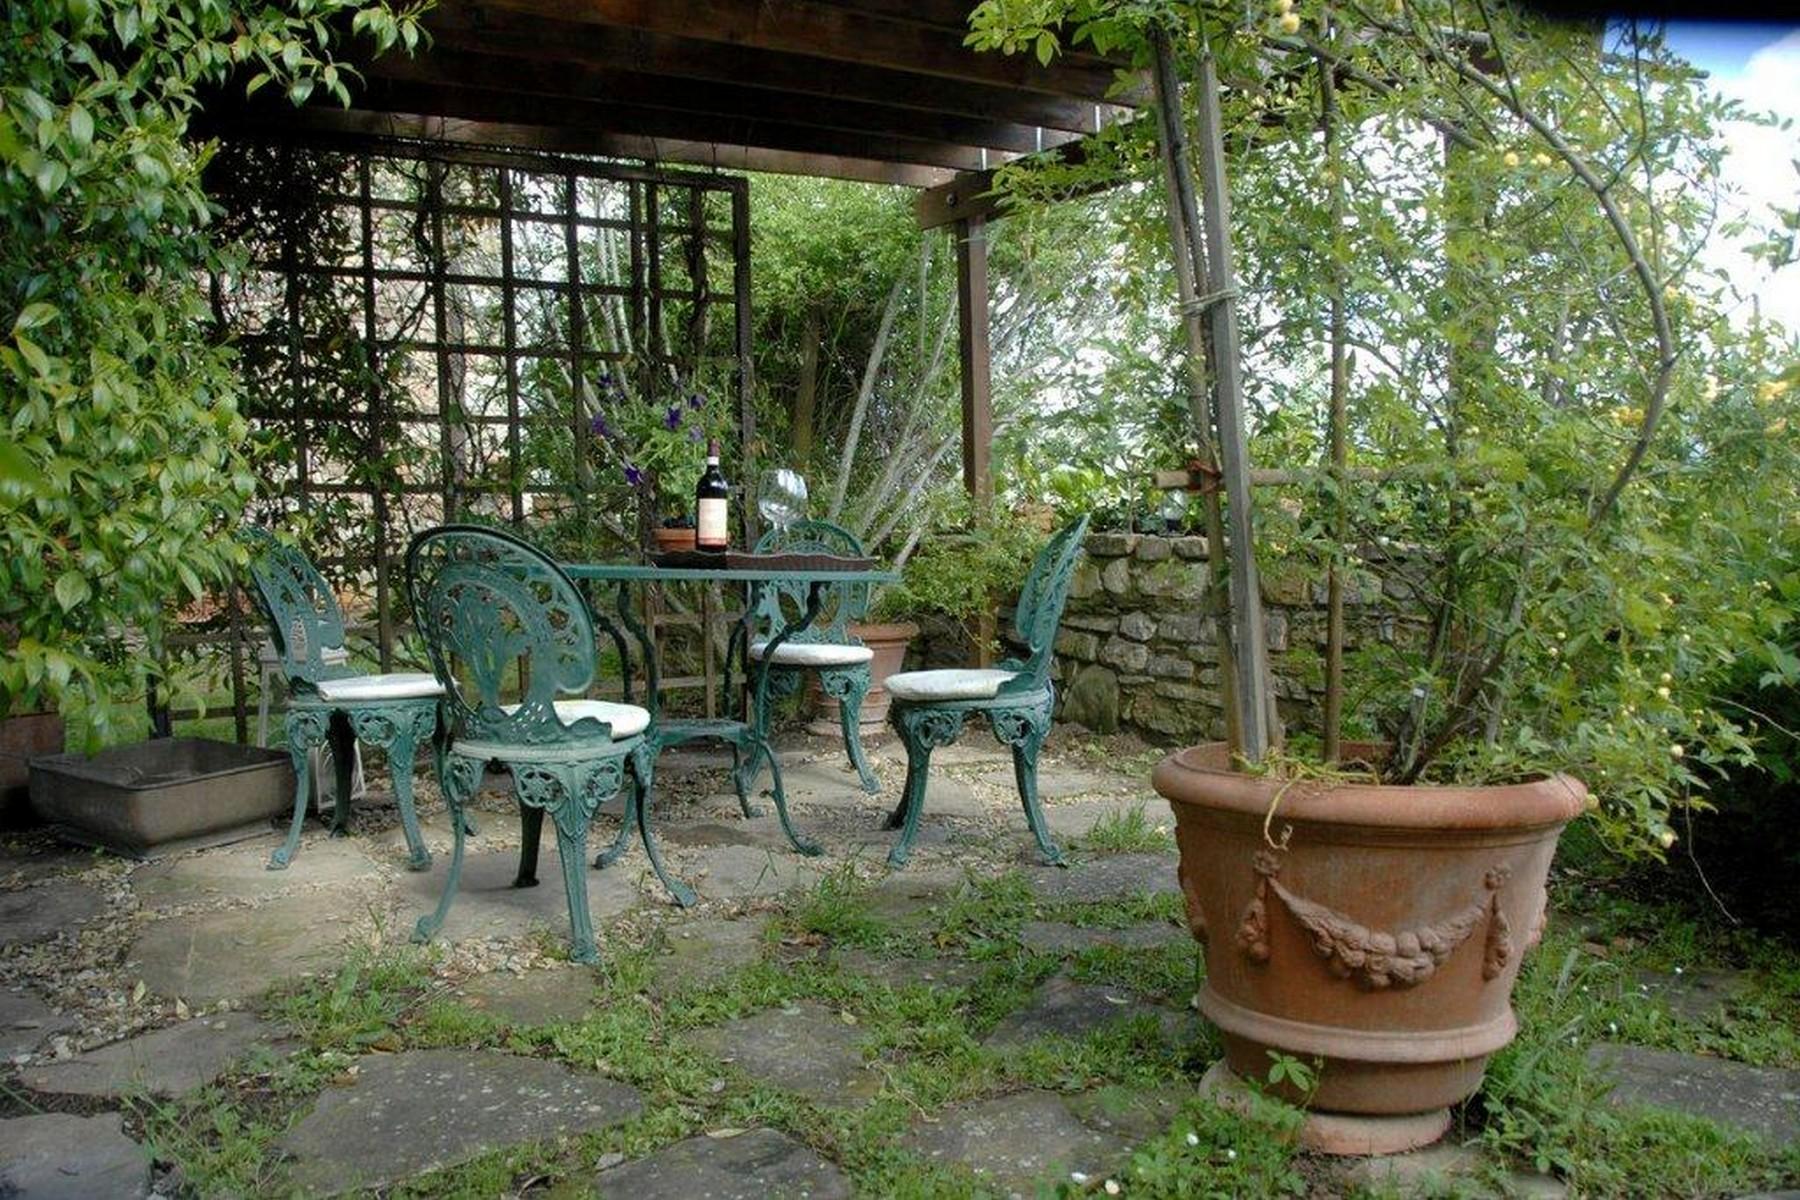 Villa in Vendita a Greve In Chianti: 5 locali, 400 mq - Foto 4